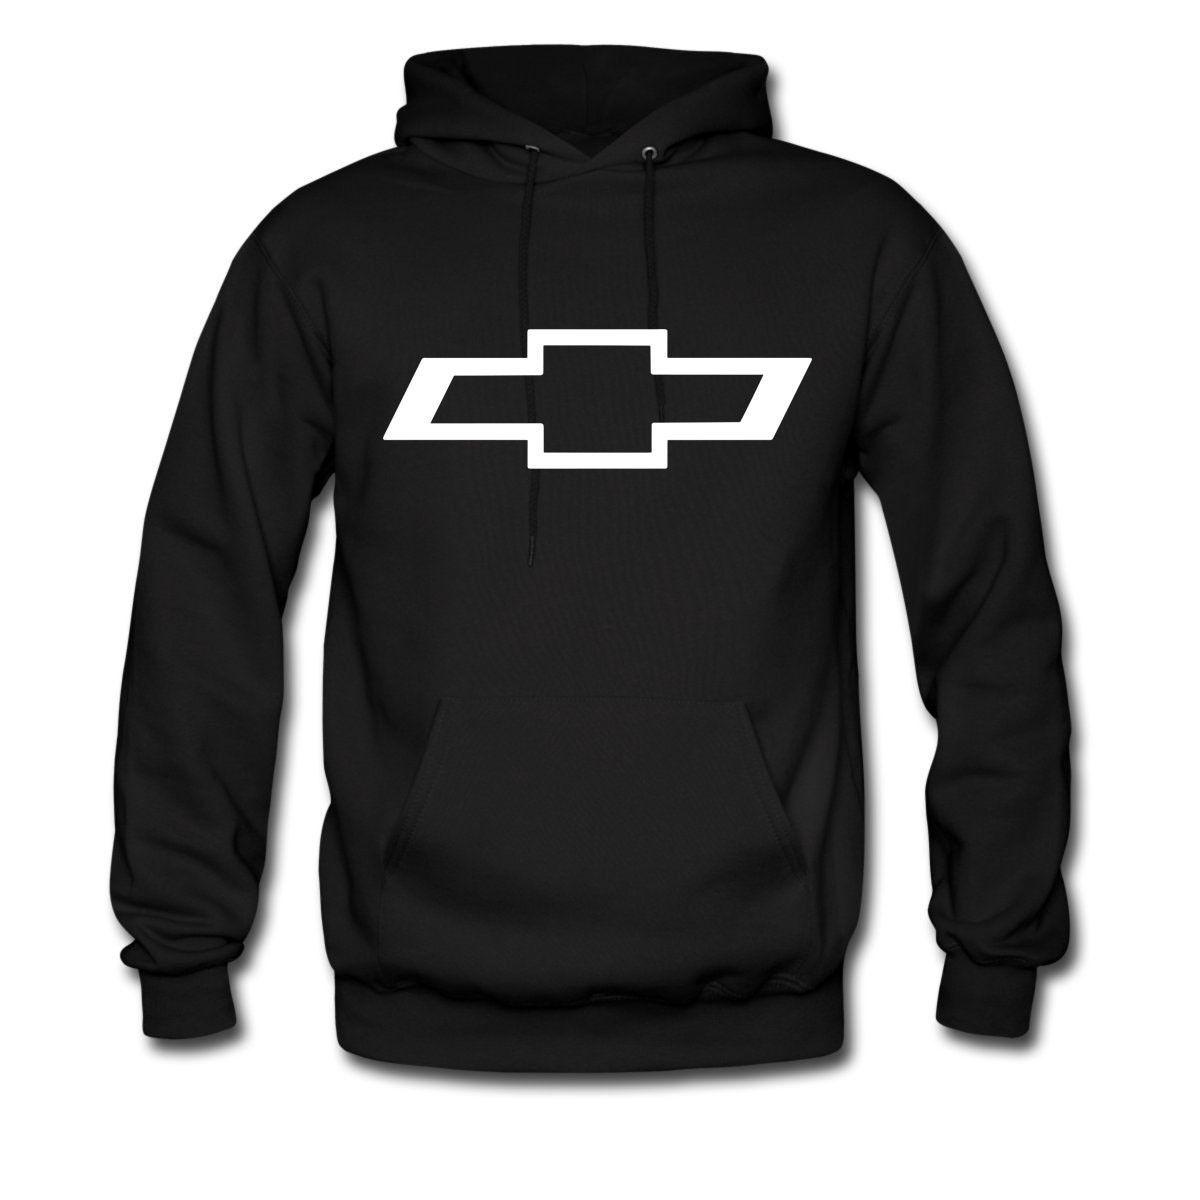 Chevy Chevrolet Hoodie Sweatshirt Sweatshirts Hoodies Truck Shirts [ 1200 x 1200 Pixel ]